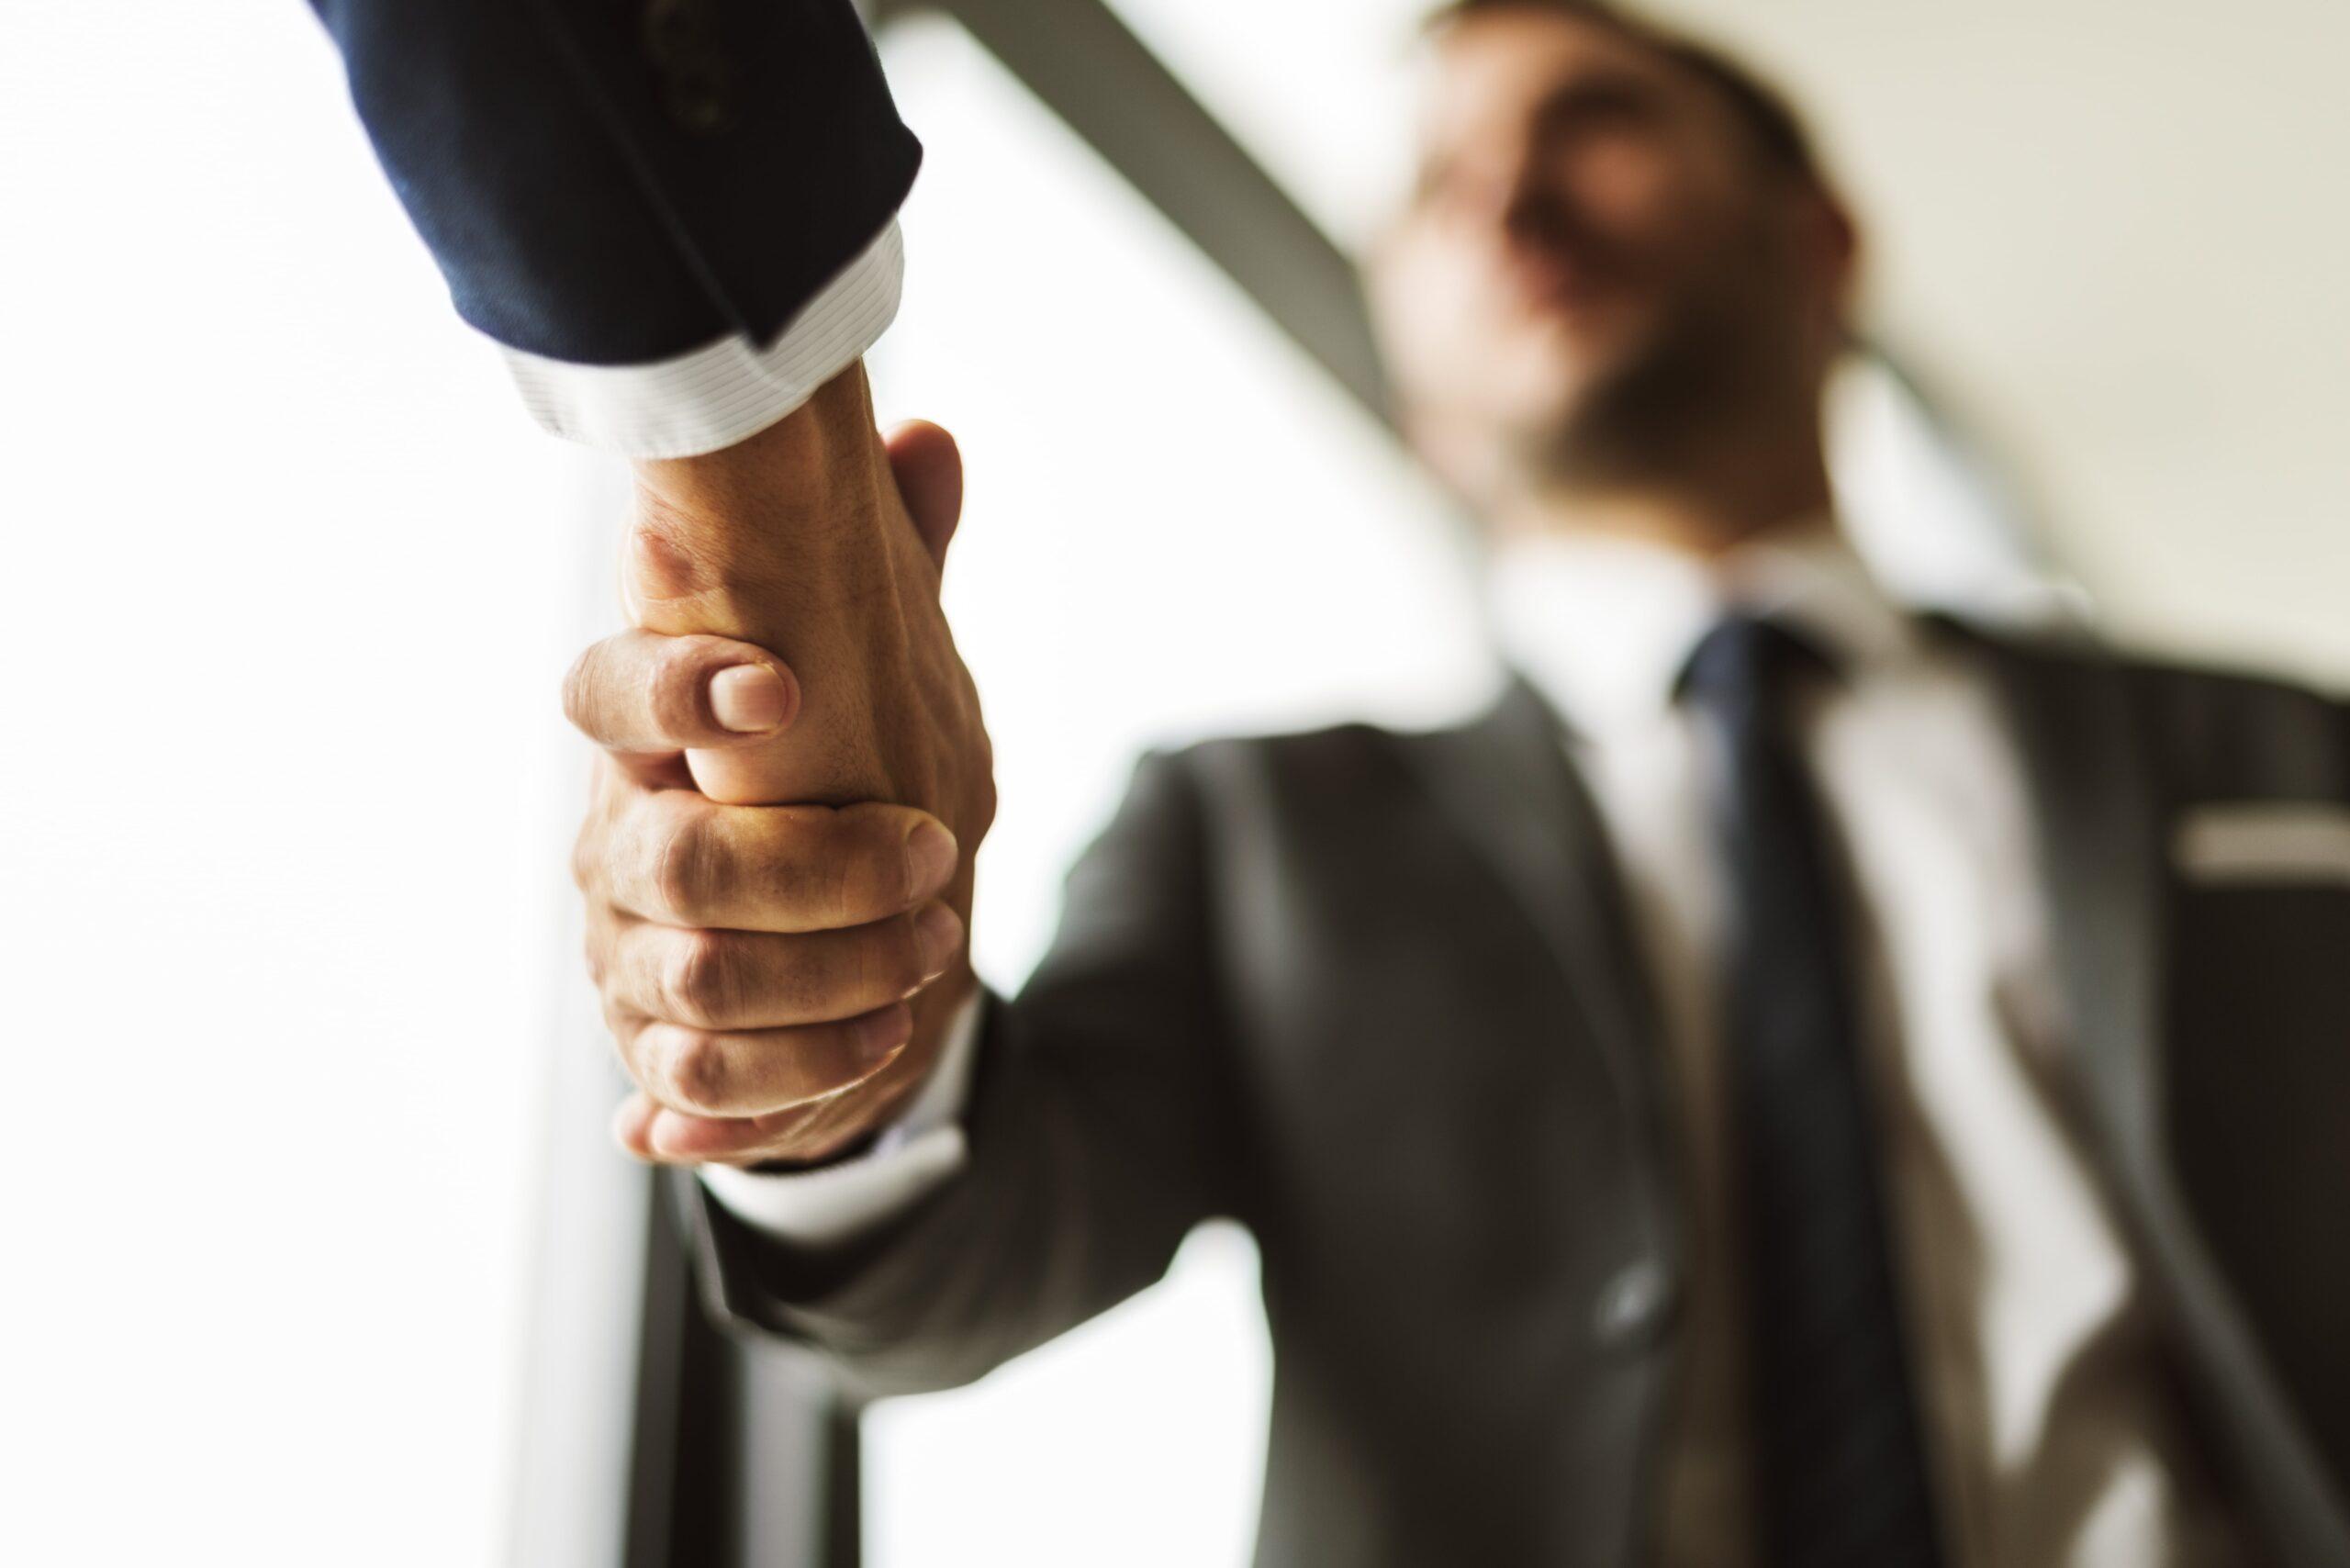 deal-businessmen-handshake-partnership-concept-PF3GLKS-min